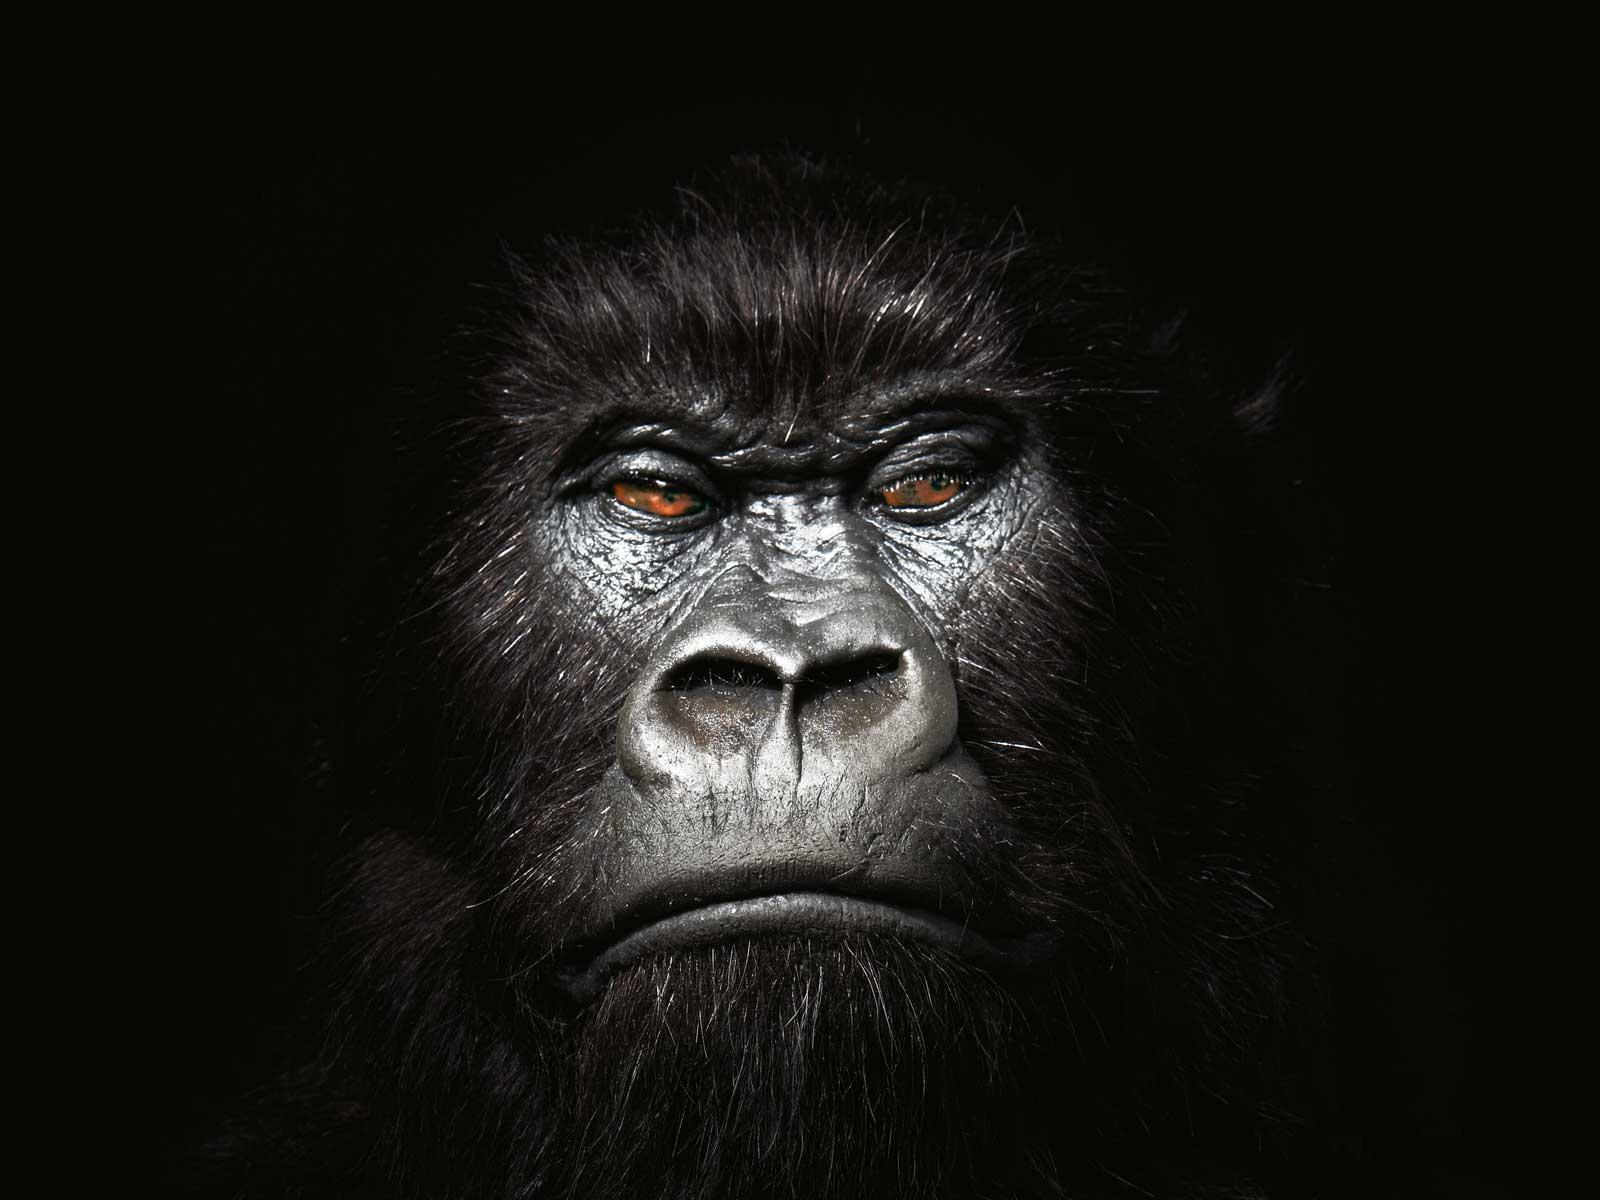 Gorilla Wallpaper 20   1600 X 1200 stmednet 1600x1200